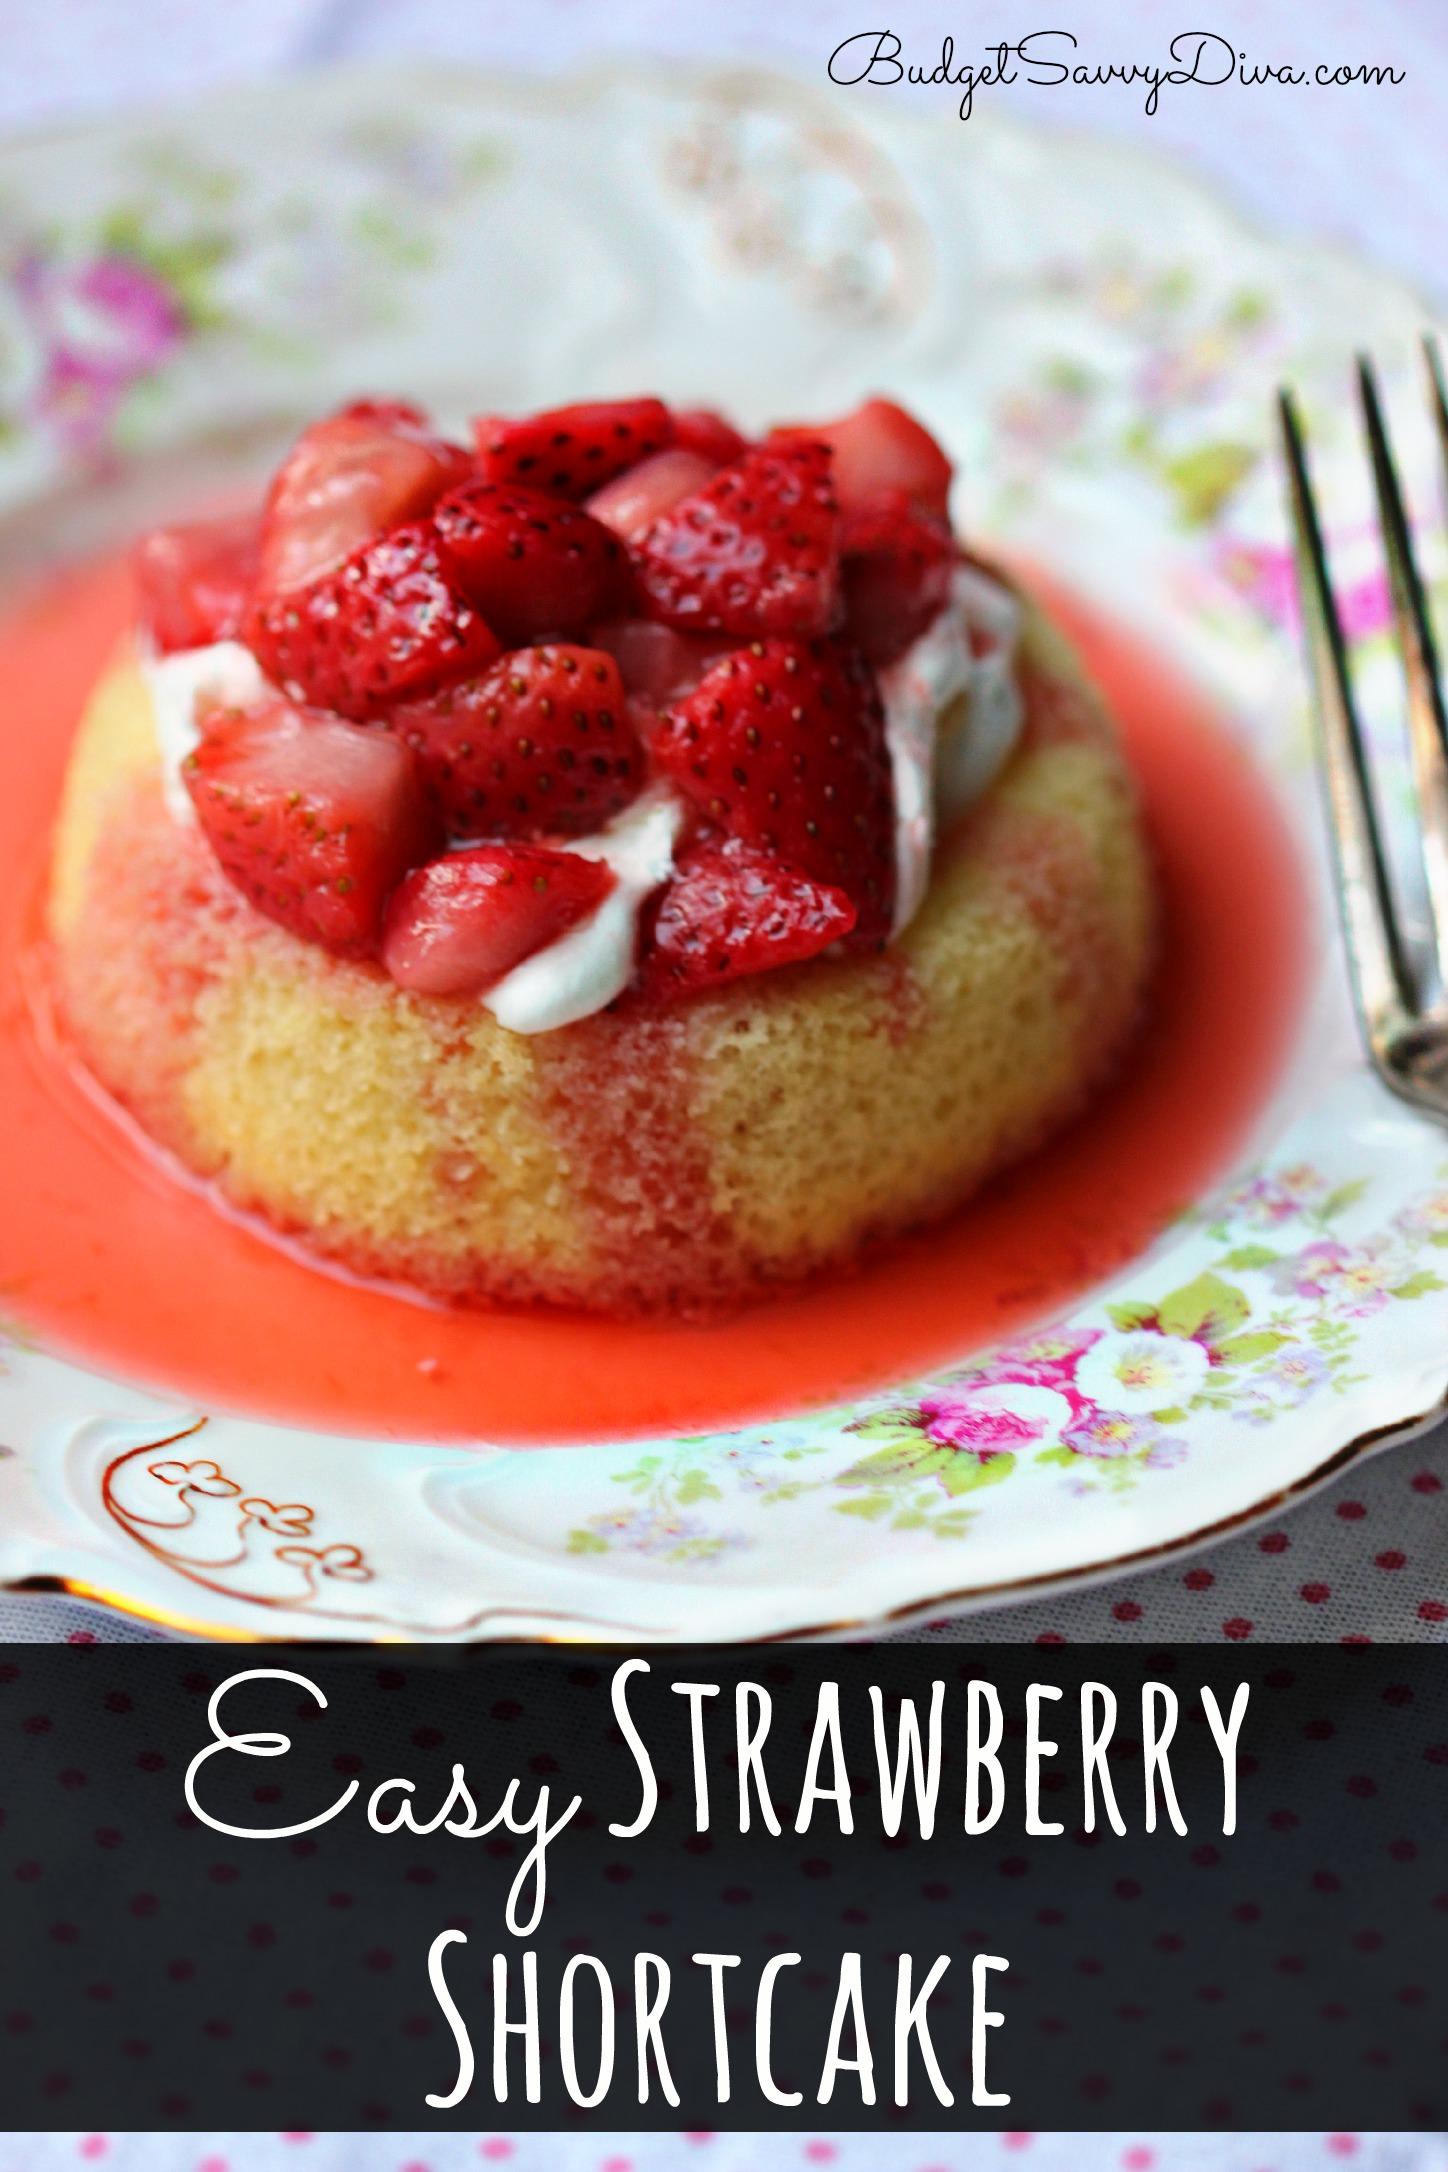 Easy Strawberry Shortcake Recipe   Budget Savvy Diva